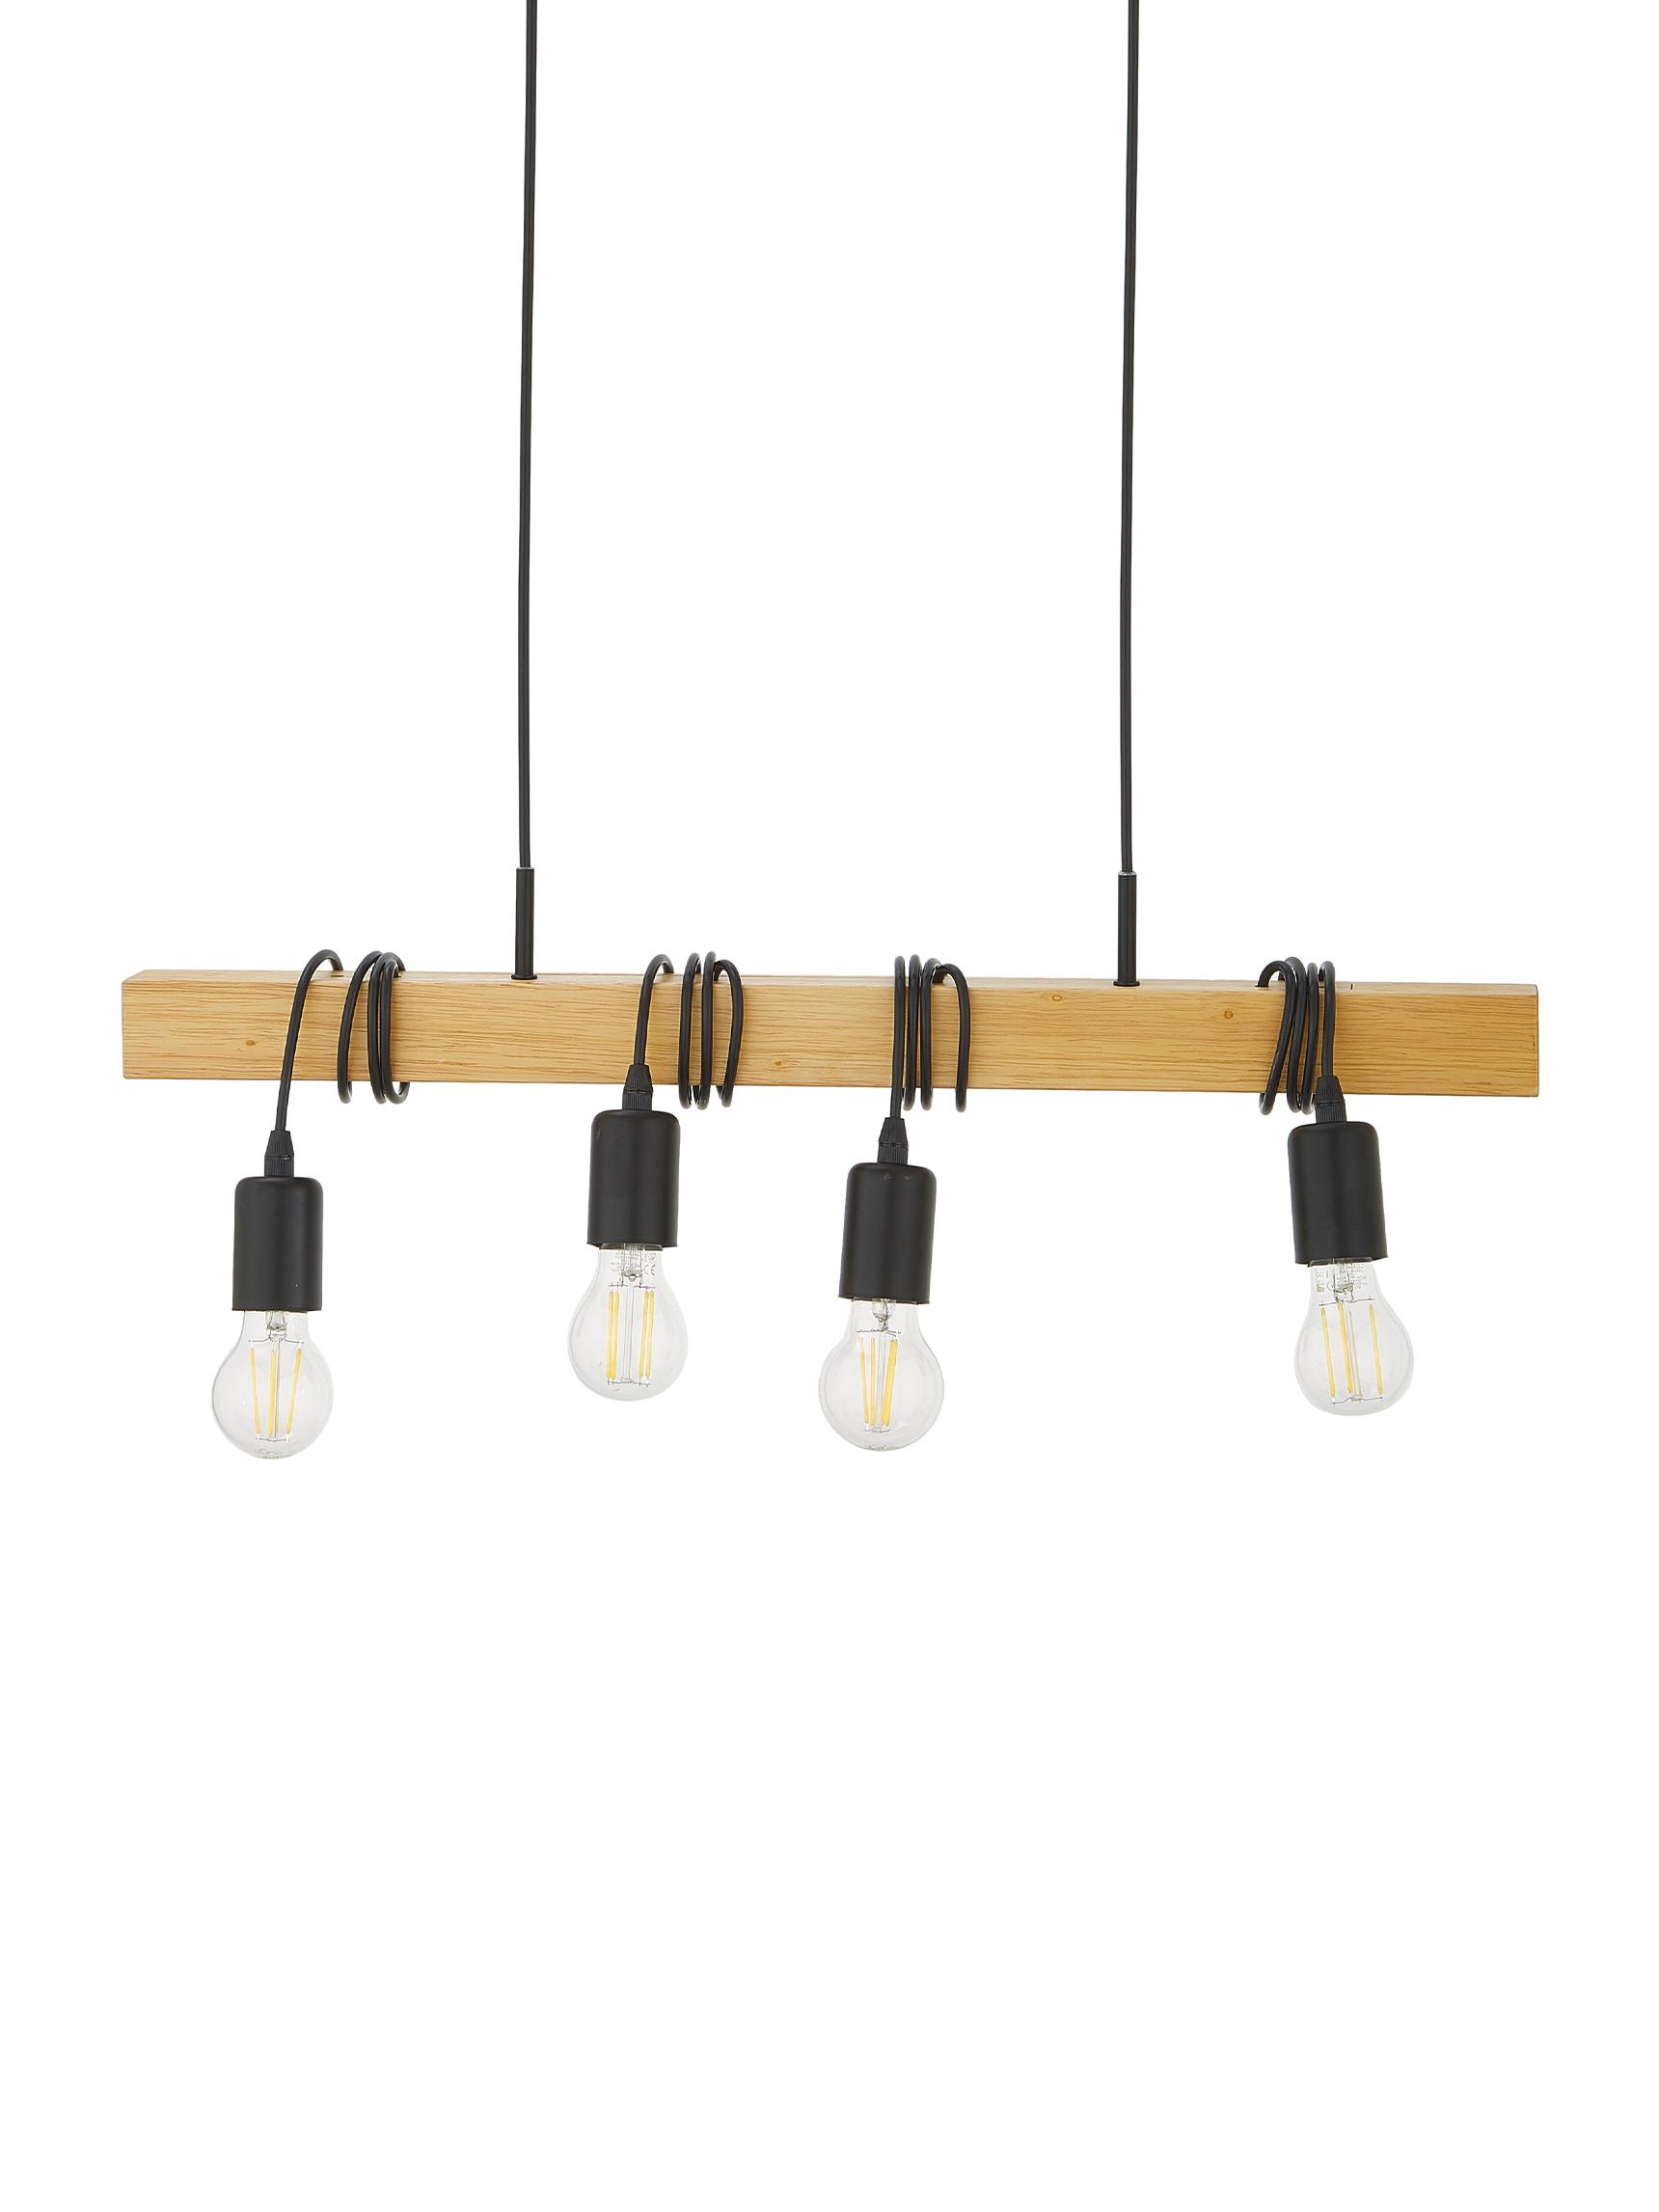 Pendelleuchte Townshend, Schwarz, Holz, 70 x 110 cm